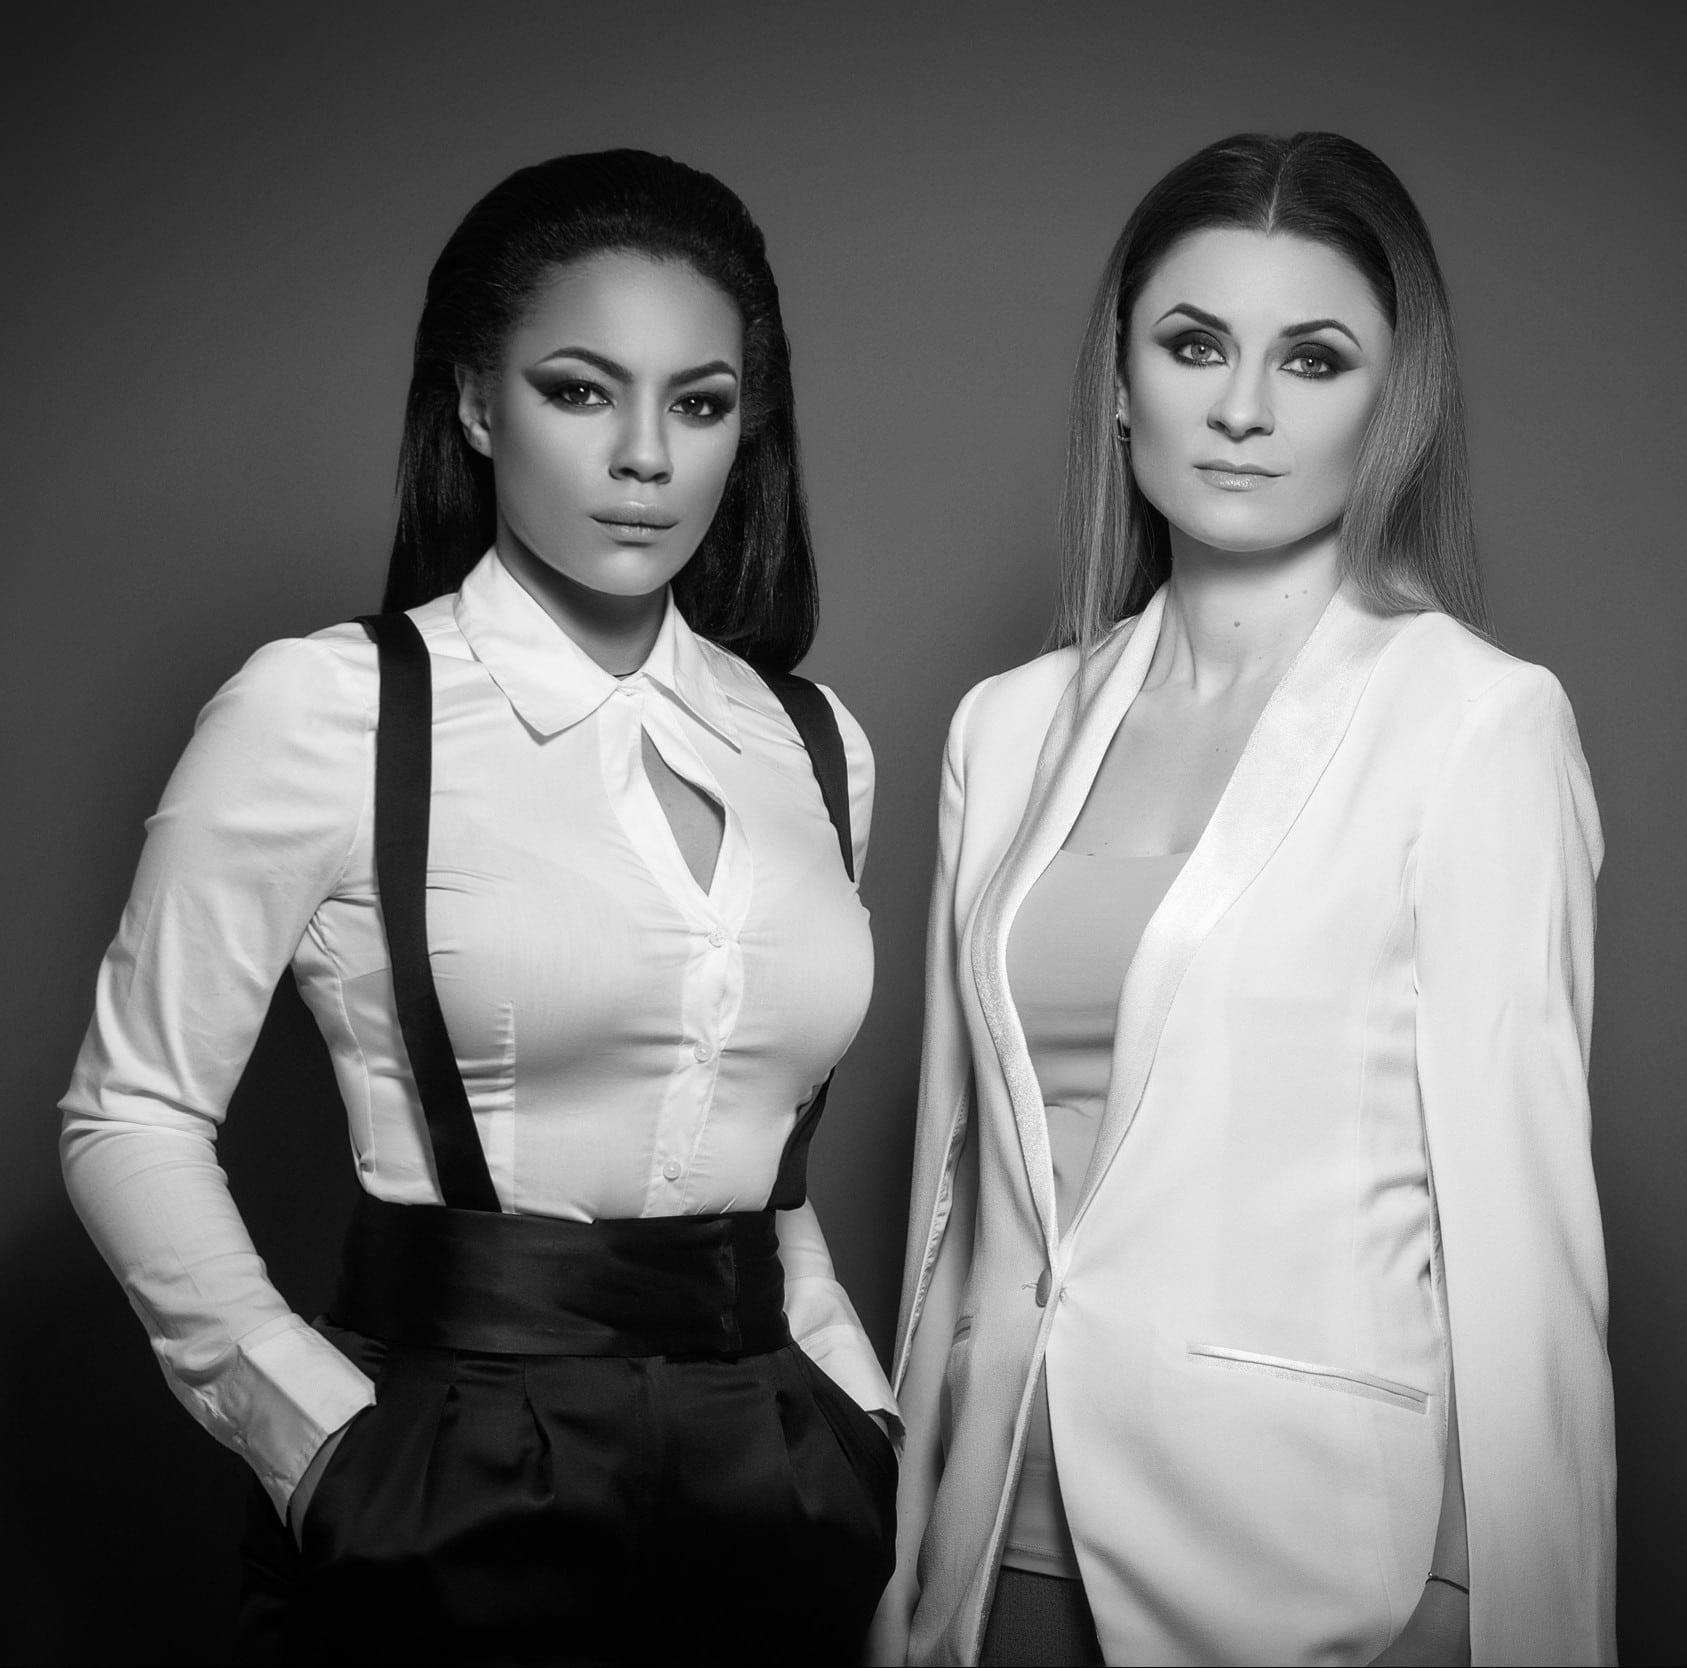 Rosalie Kanda Editor-in-chief LUXURY Ținută: Ionela Ghibuși, Elisabeta Istrate PR Manager SEPHORA